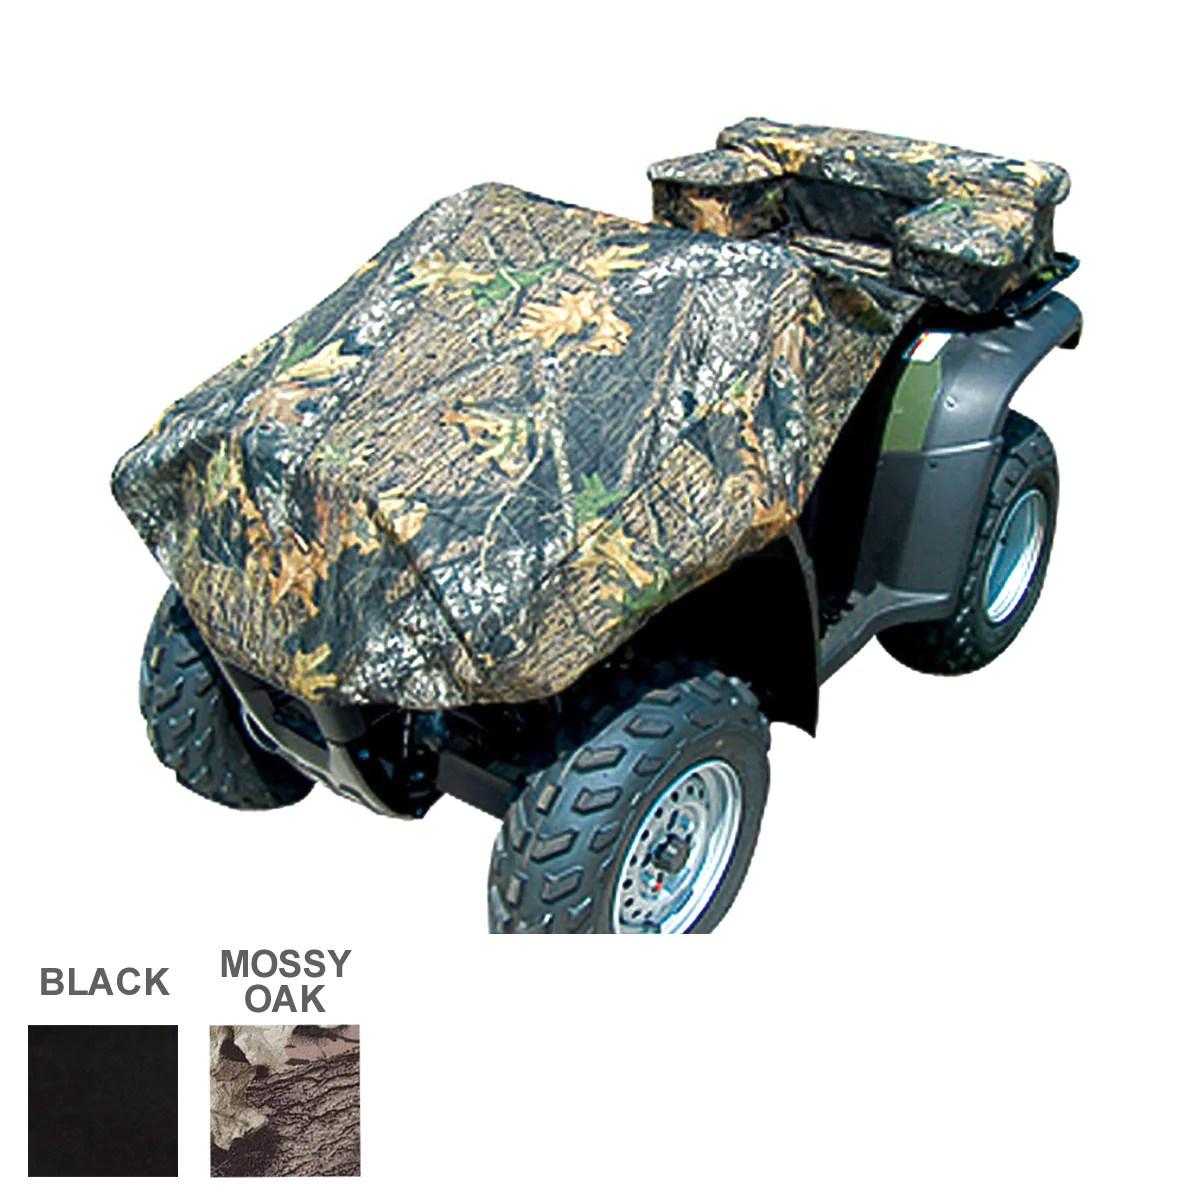 airhead atv rack bag cooler cover black or mossy oak  [ 1200 x 1200 Pixel ]